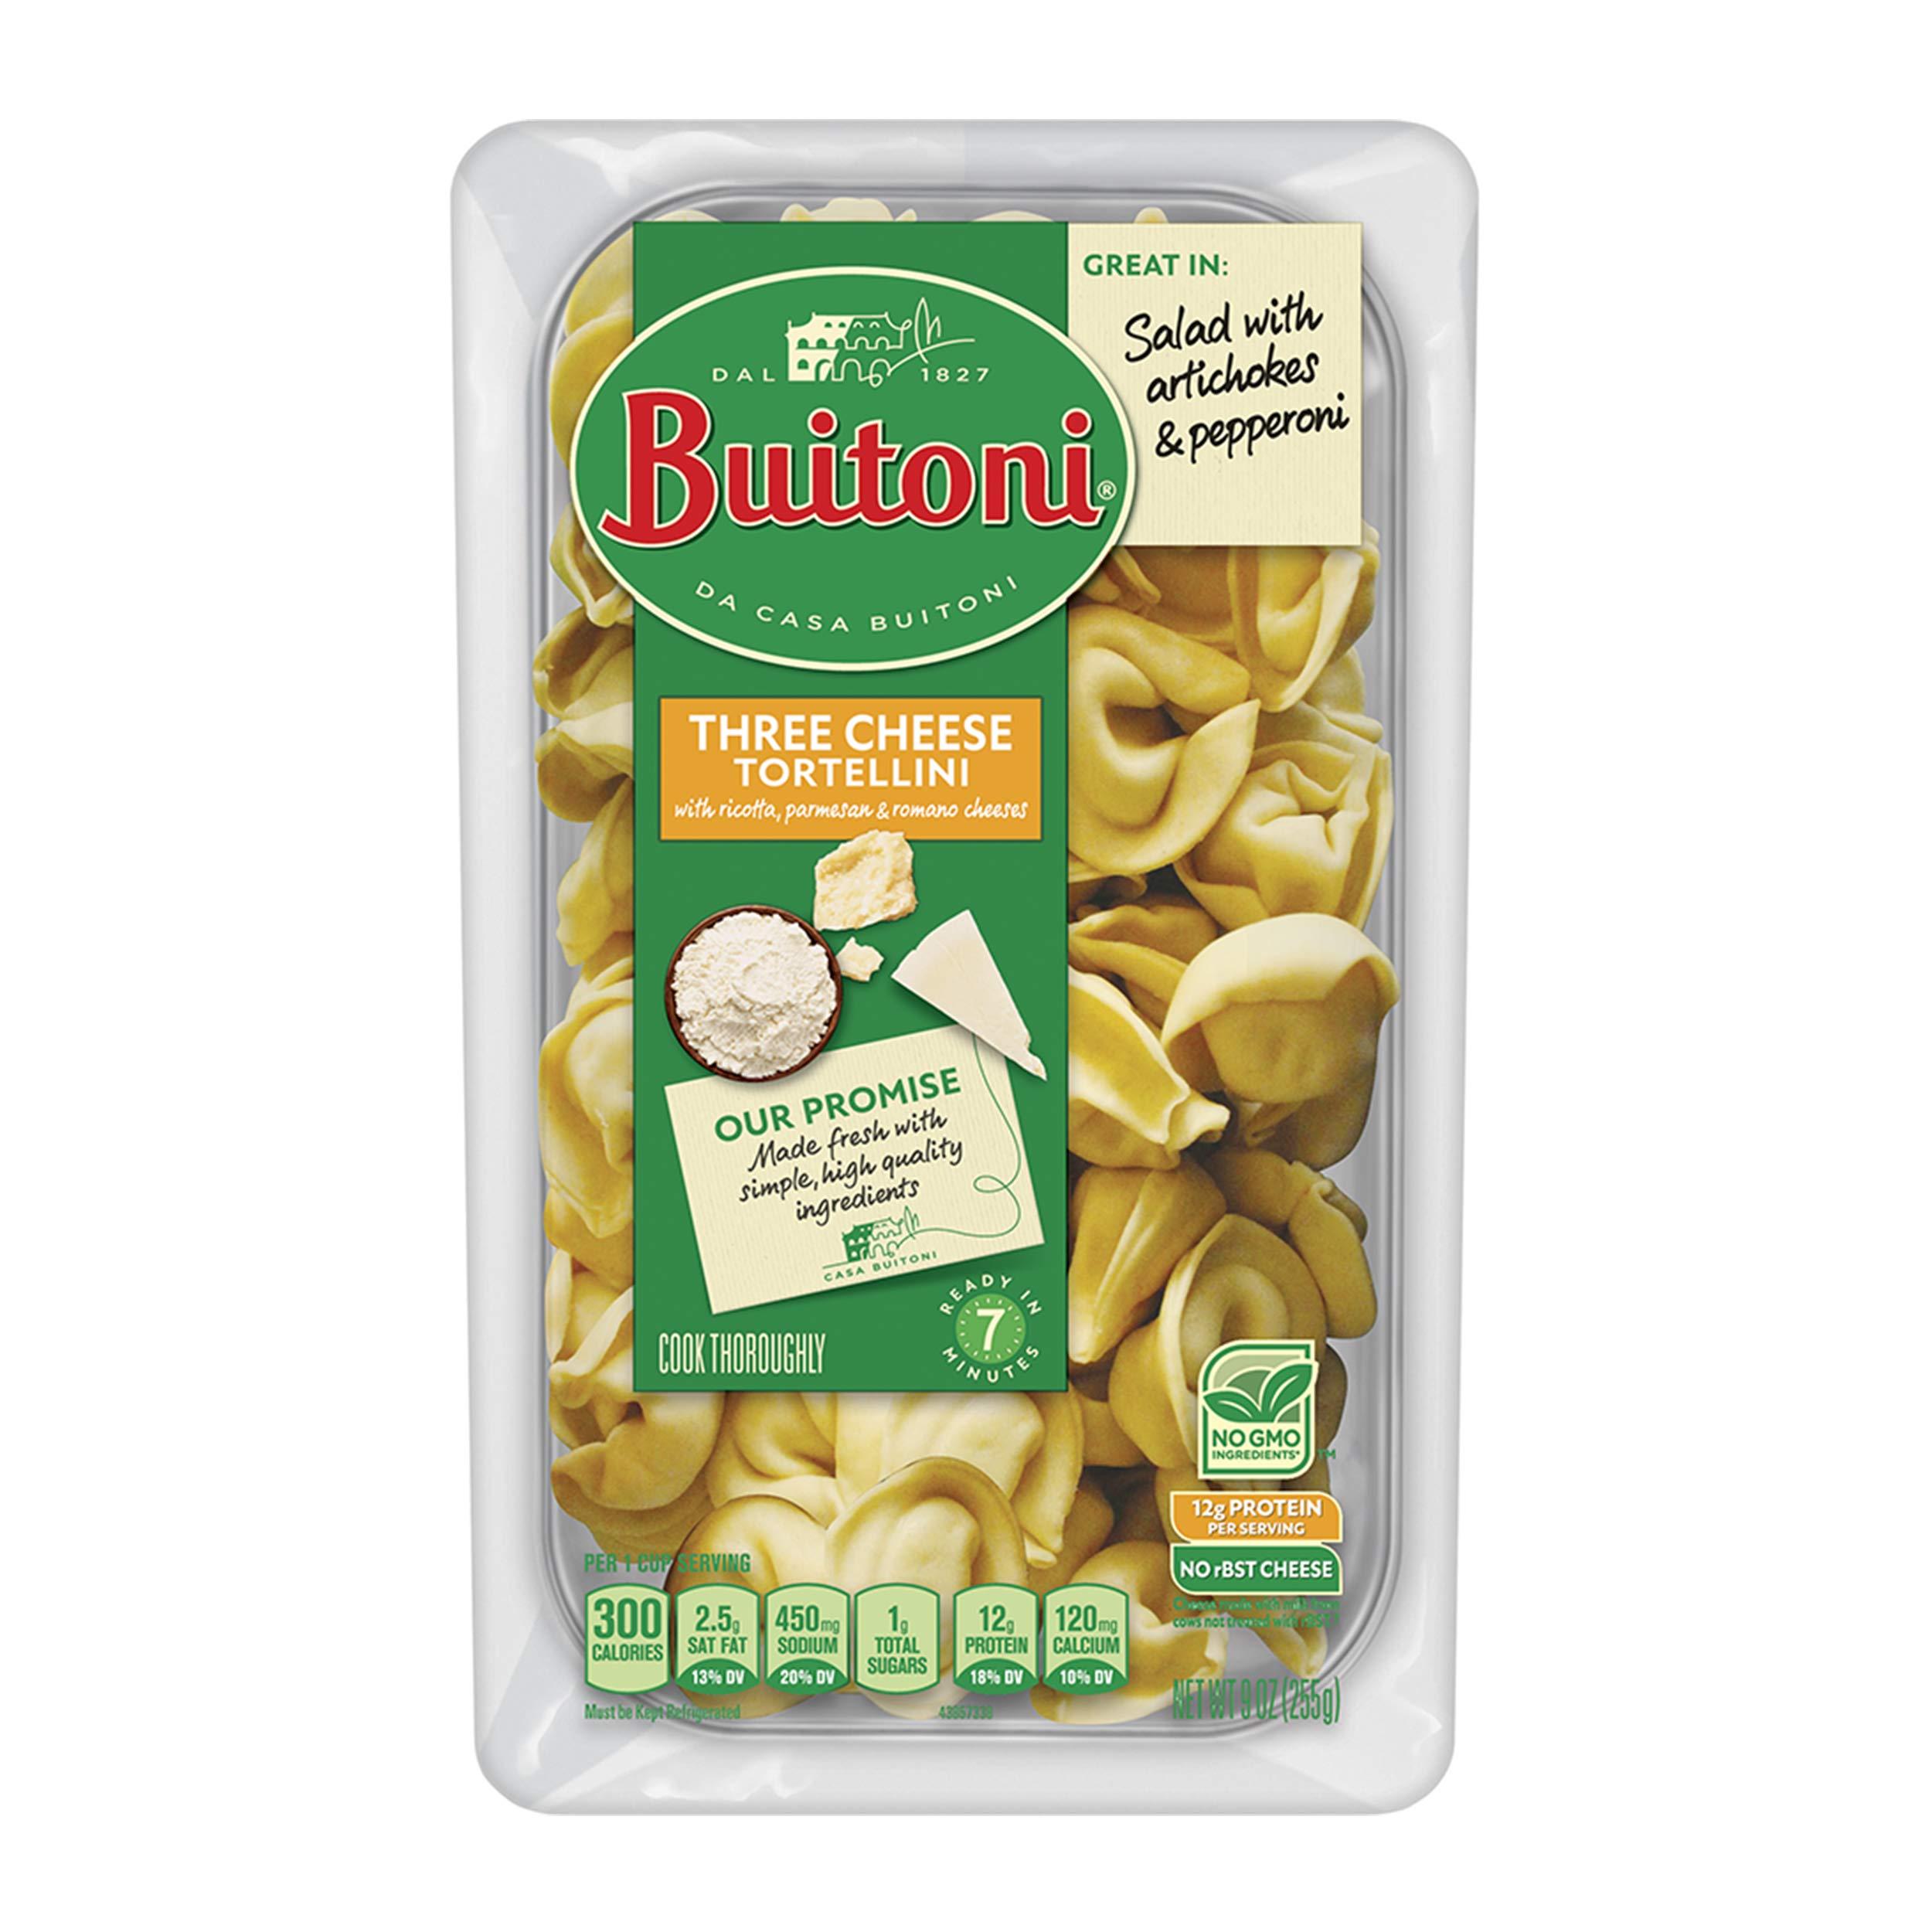 Buitoni Spinach Cheese Tortellini Refrigerated Pasta 9 Oz Amazon